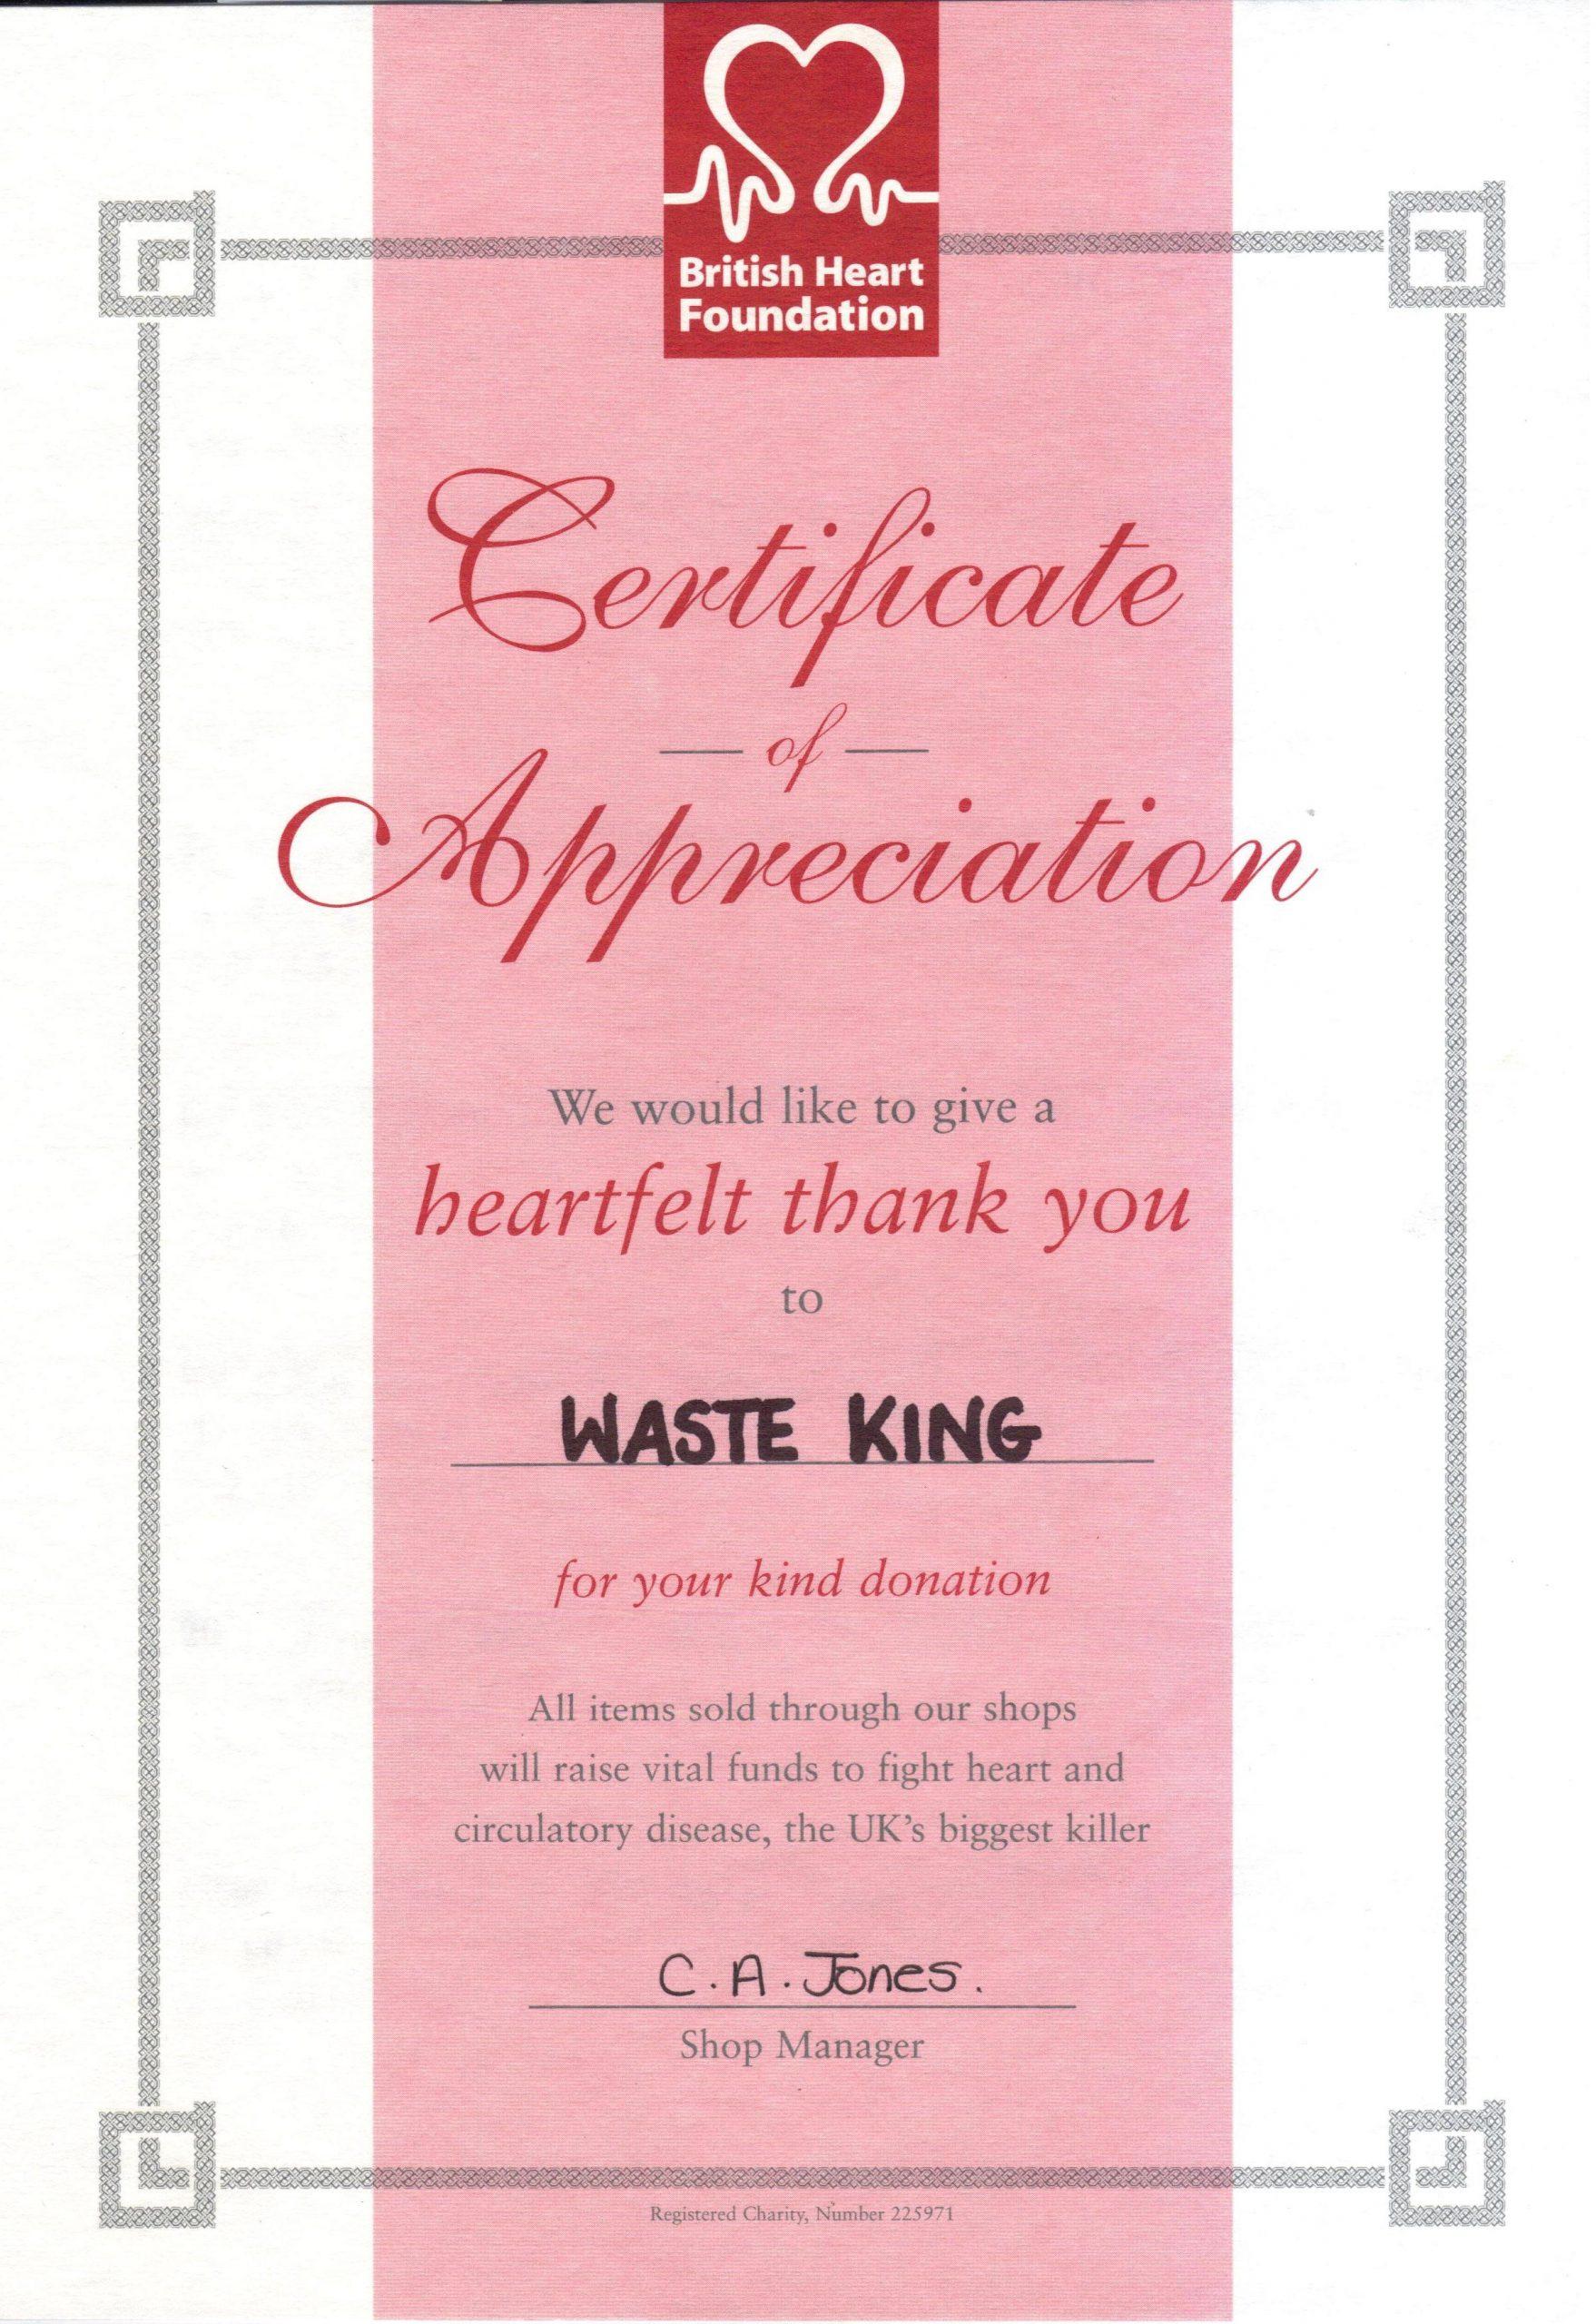 Waste King wins the British Heart Foundation's heartfelt thanks